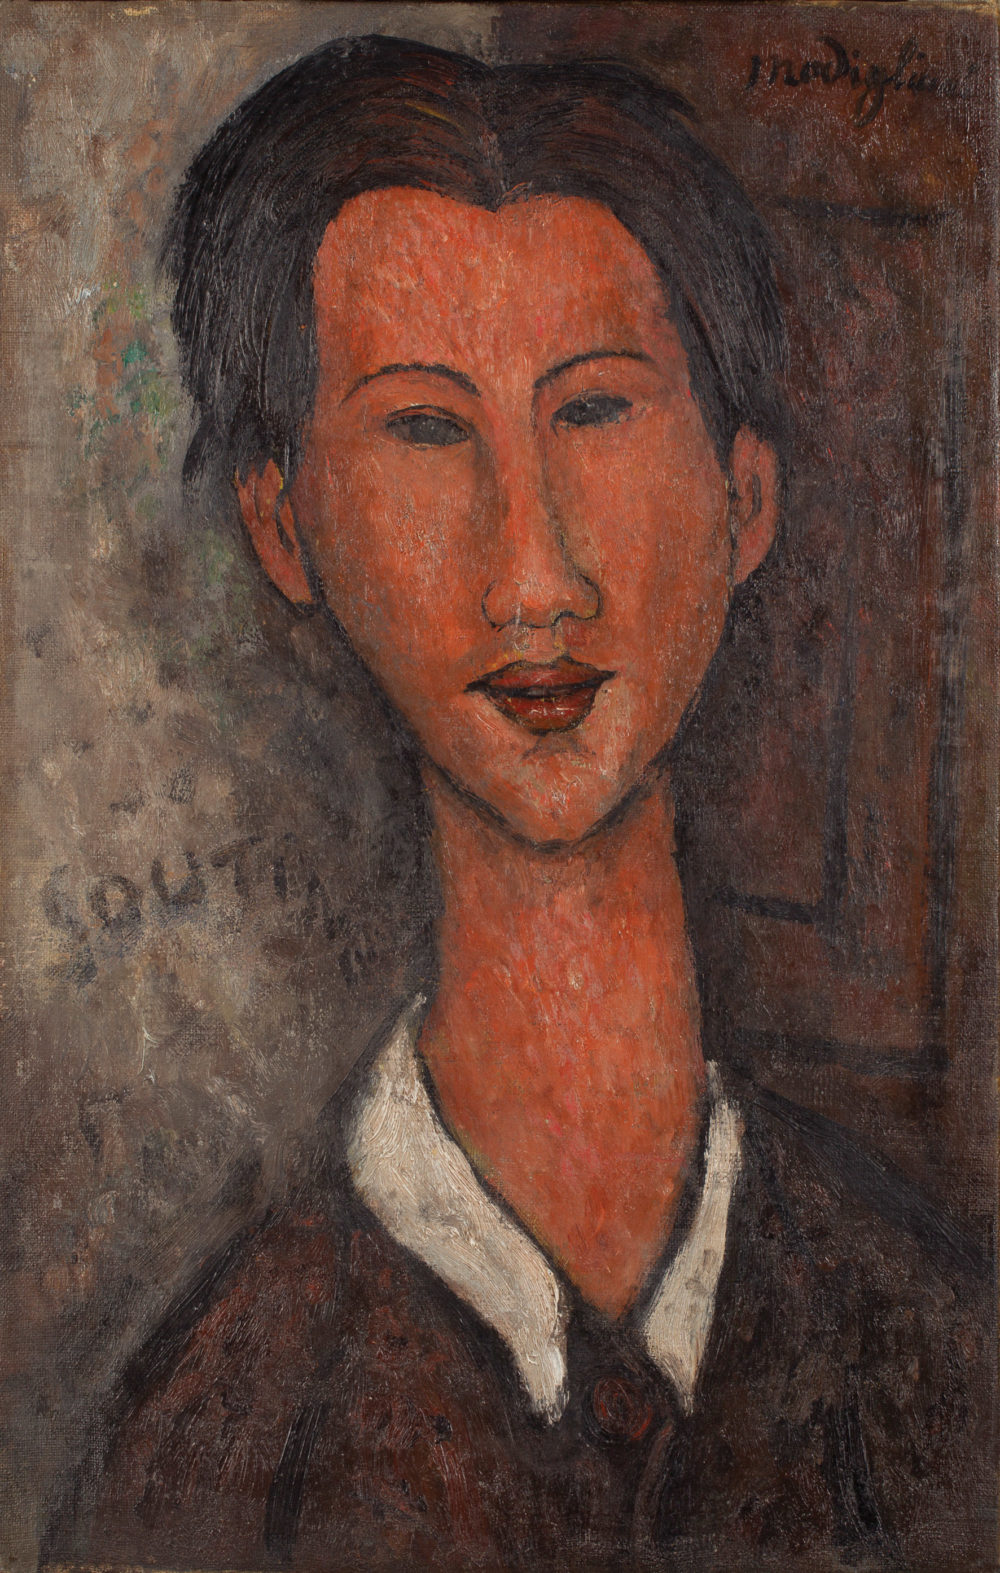 Portrait of Chaim Soutine, ένα από τα έργα που θεωρούνται πλαστά.